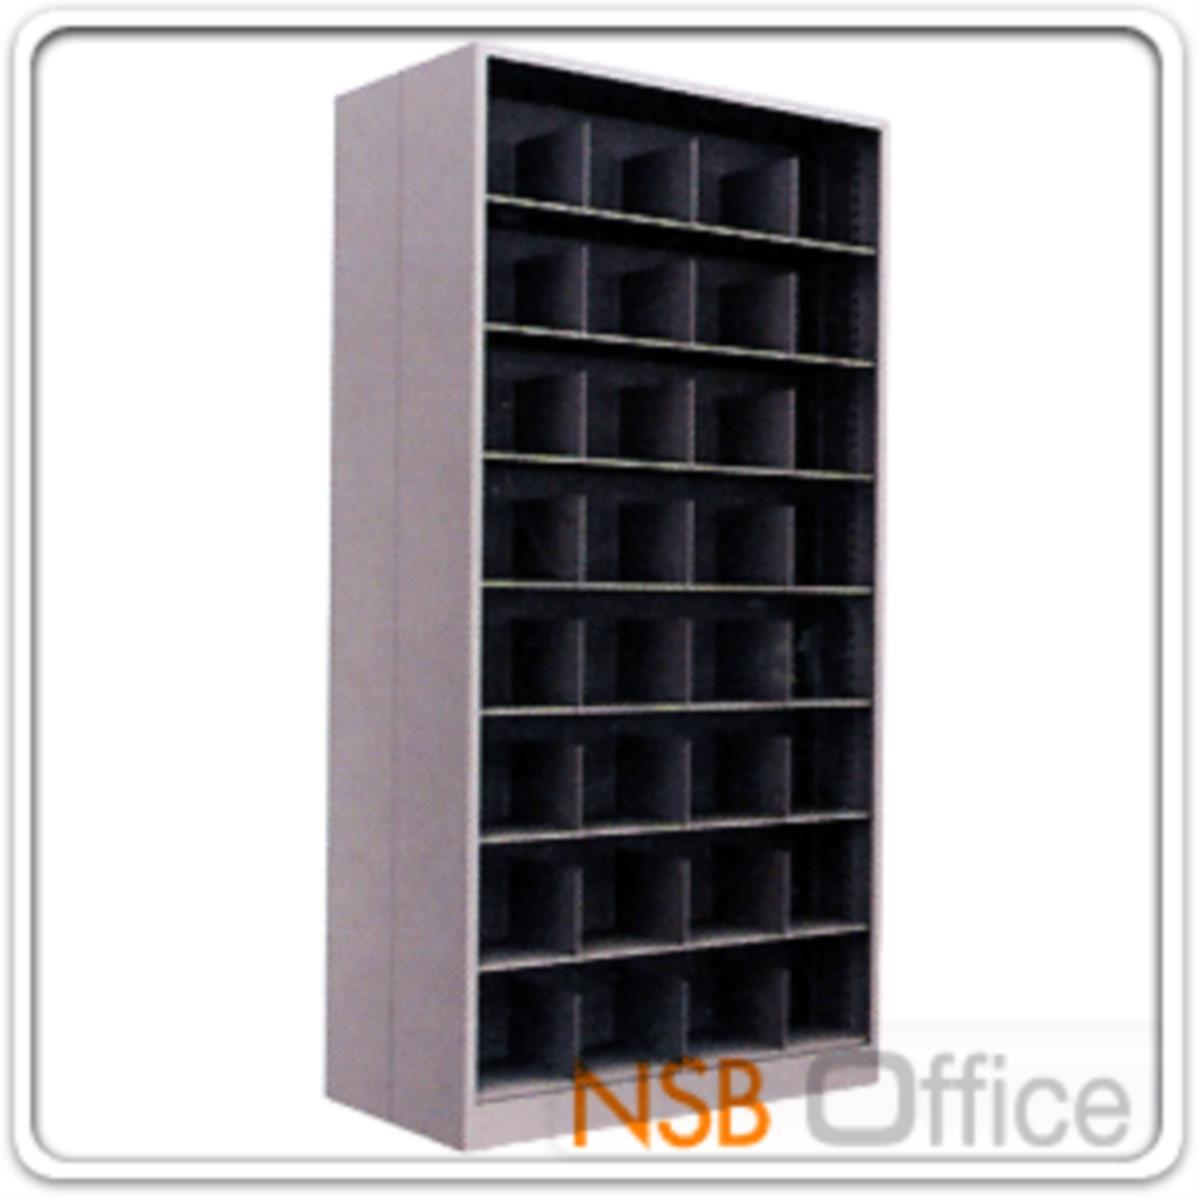 D01A028:ตู้เก็บบัตรขนาด OPD 2 หน้า 8 ชั้น 64 ช่อง  รุ่น Lucille (ลูซิล) ขนาด 106.6W*213.5H cm.